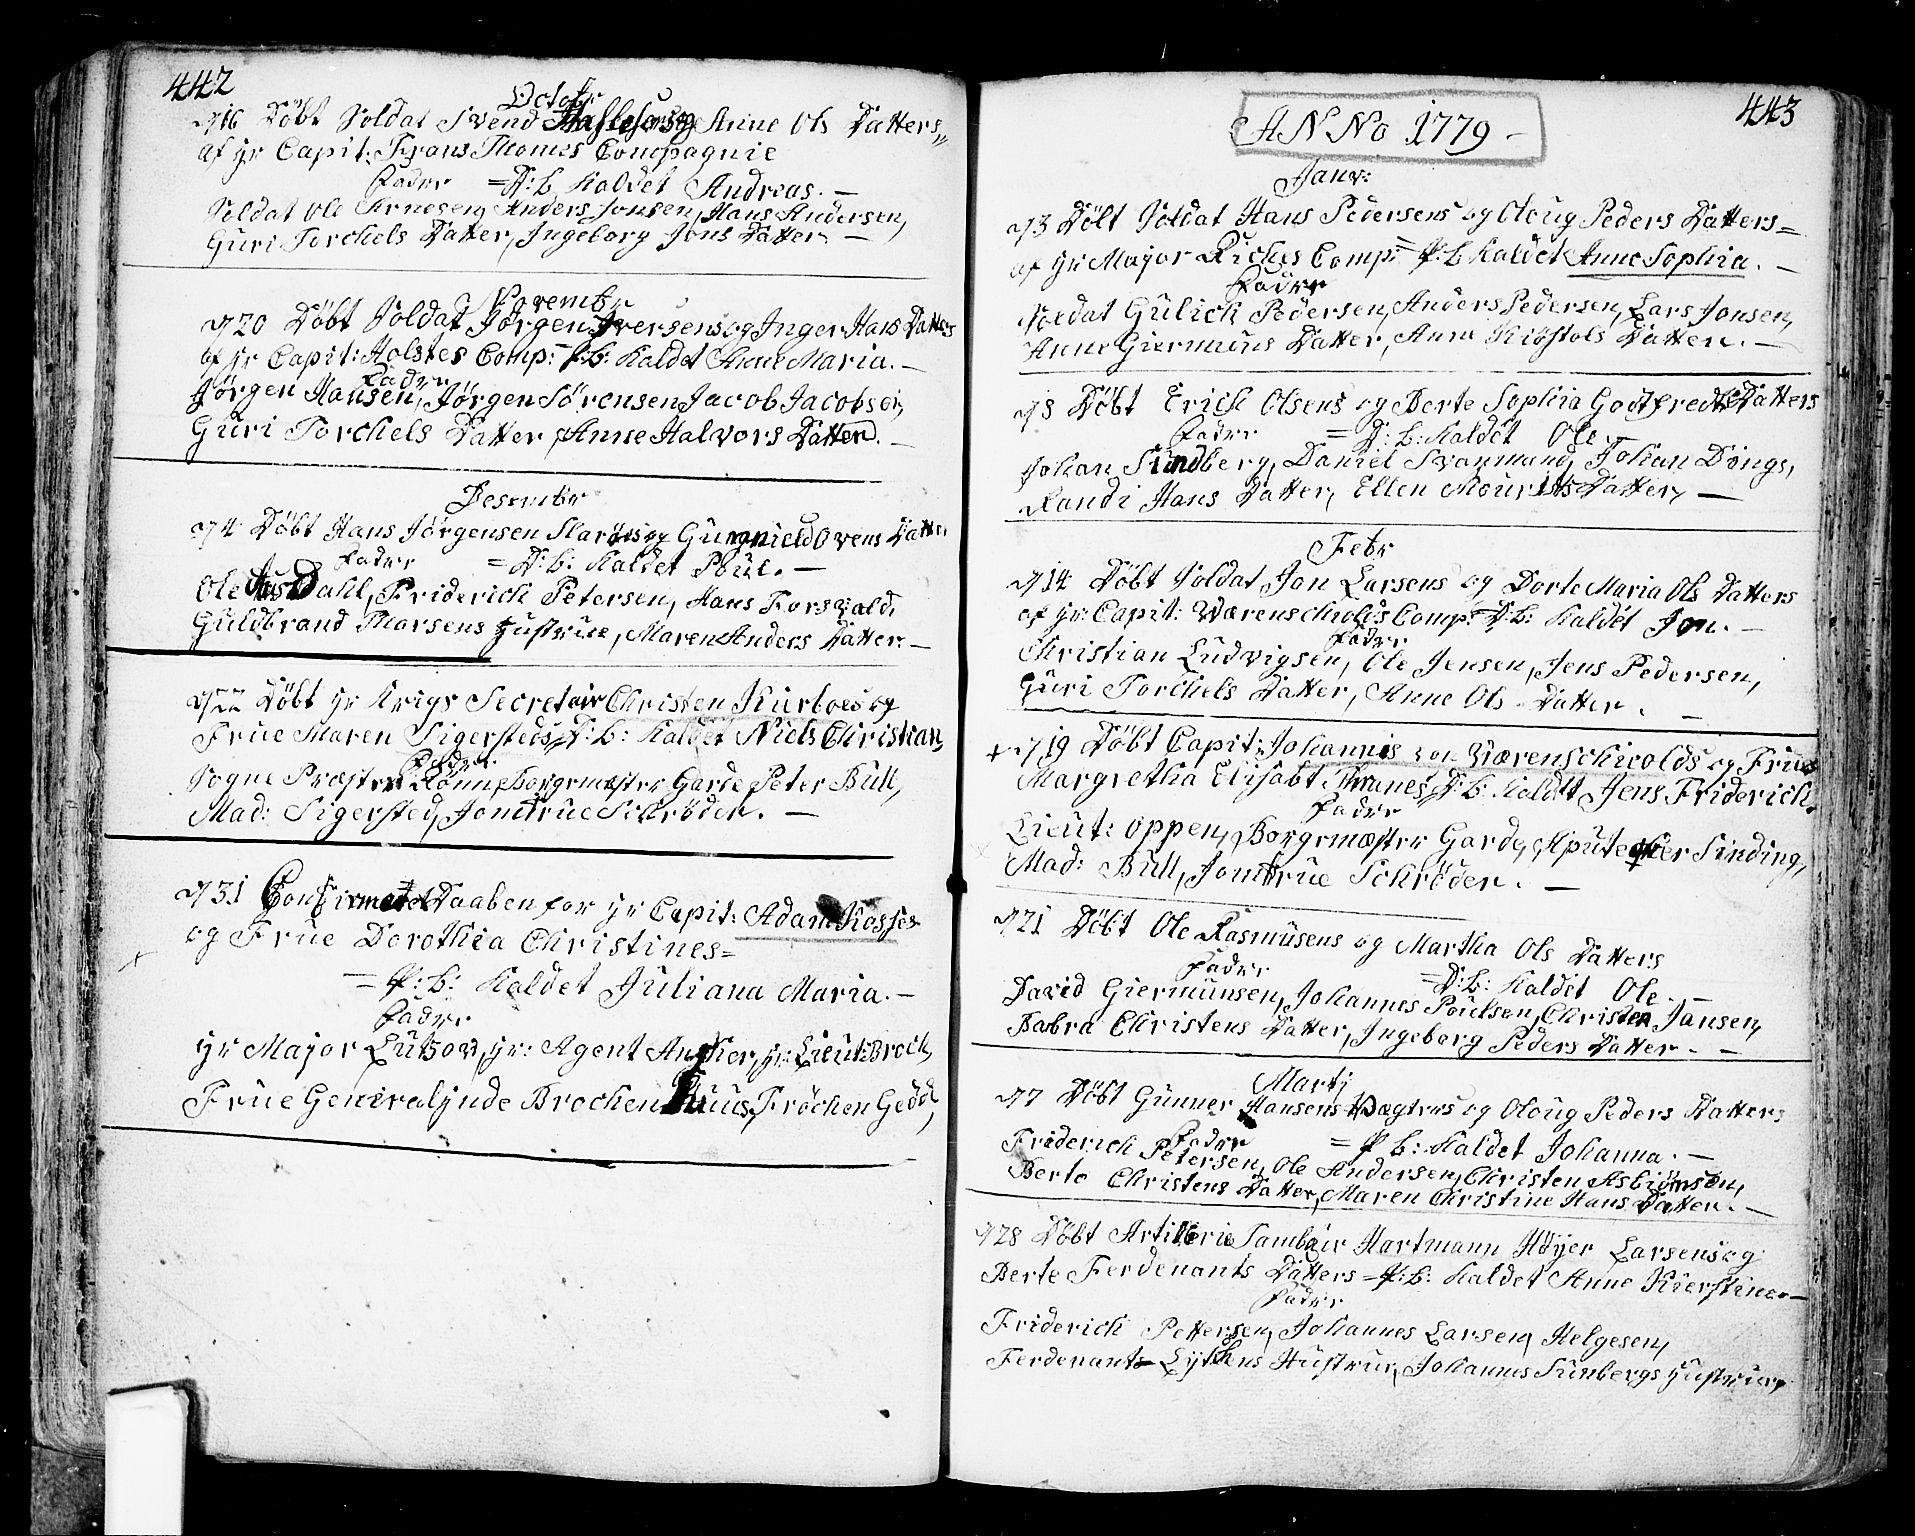 SAO, Fredrikstad prestekontor Kirkebøker, F/Fa/L0002: Ministerialbok nr. 2, 1750-1804, s. 442-443